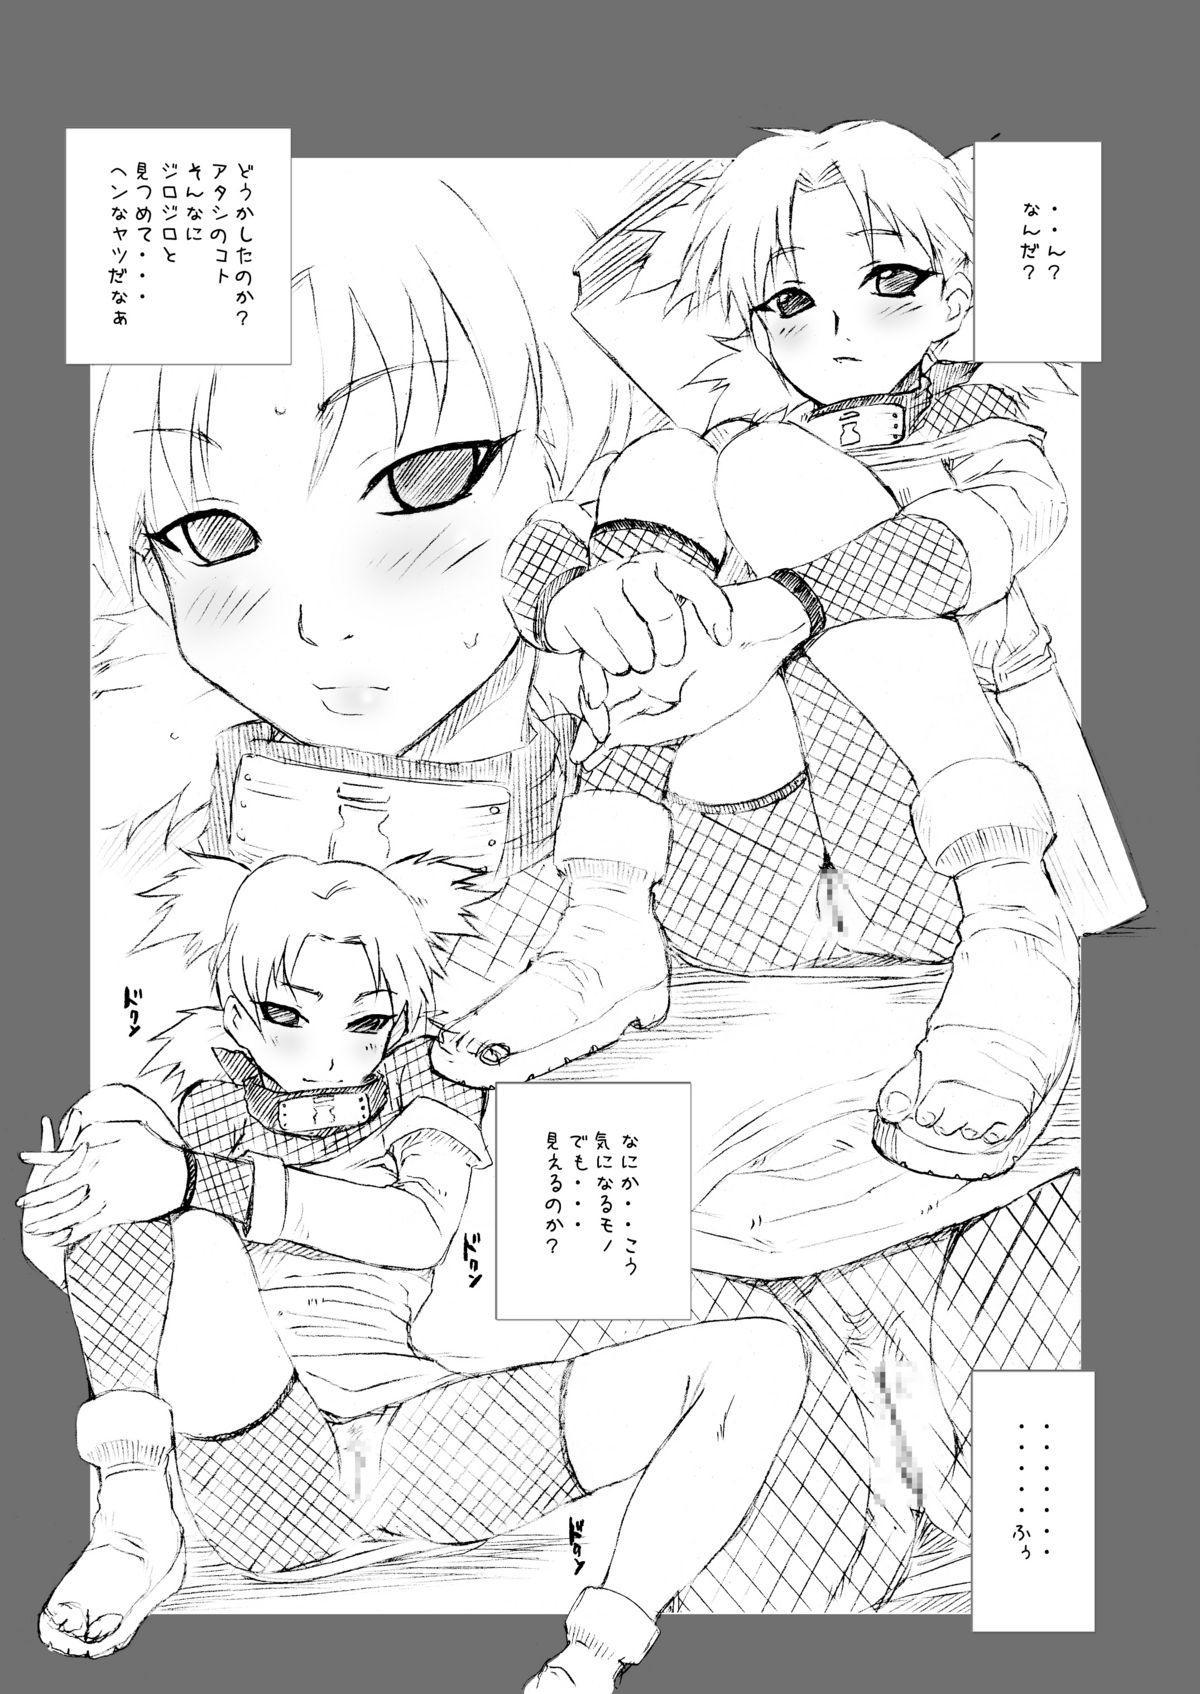 [MG WORKS (Isou Doubaku) Q.N.T DL (Naruto) [Digital] 60